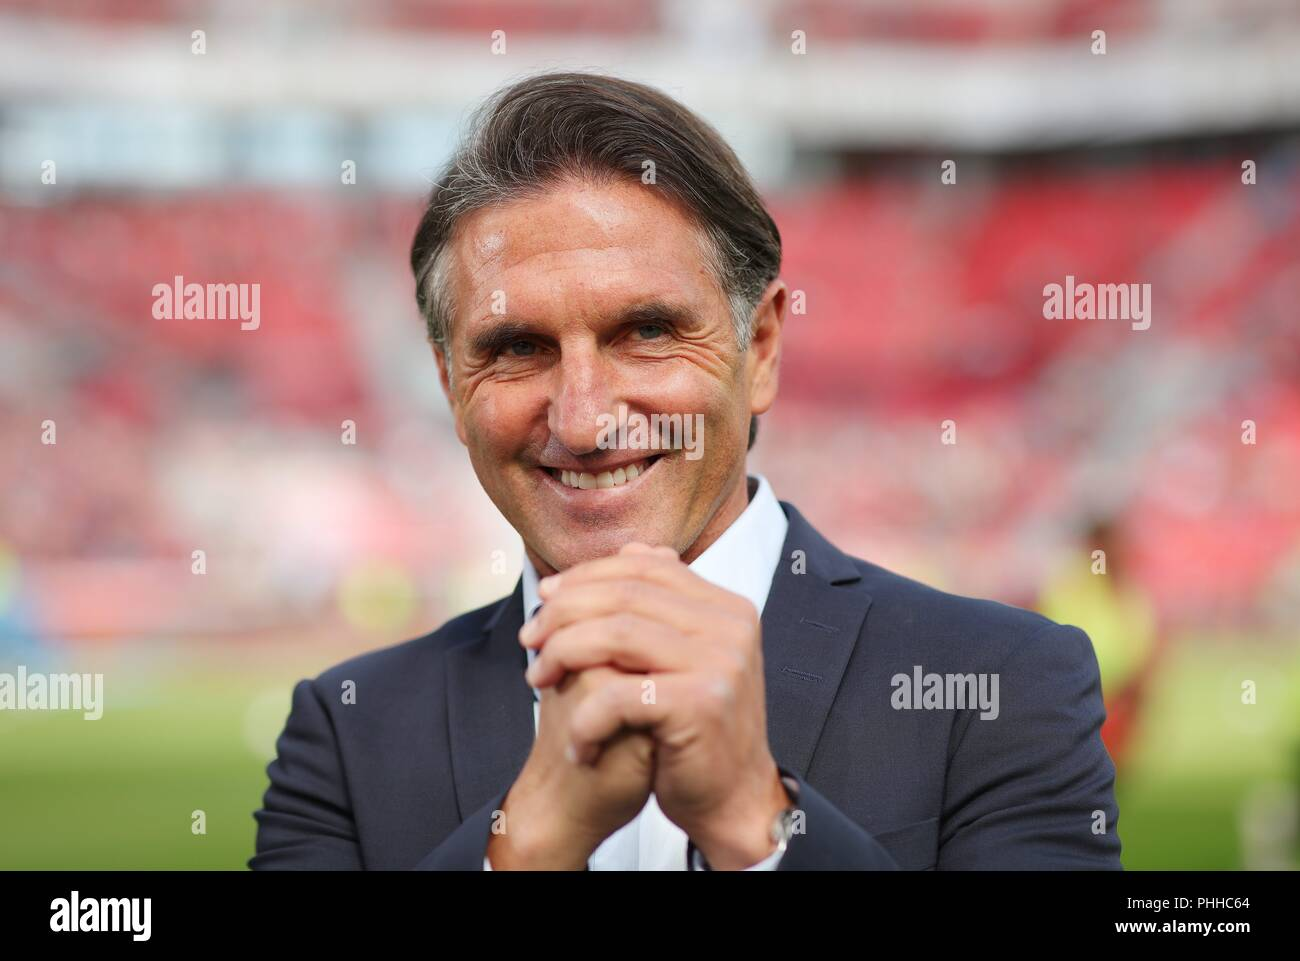 firo: 01.09.2018, Football, 1.Bundesliga, season 2018/2019, Bayer 04 Leverkusen - VfL Wolfsburg coach Bruno LABBADIA, Wolfsburg, Portrait   - Stock Image